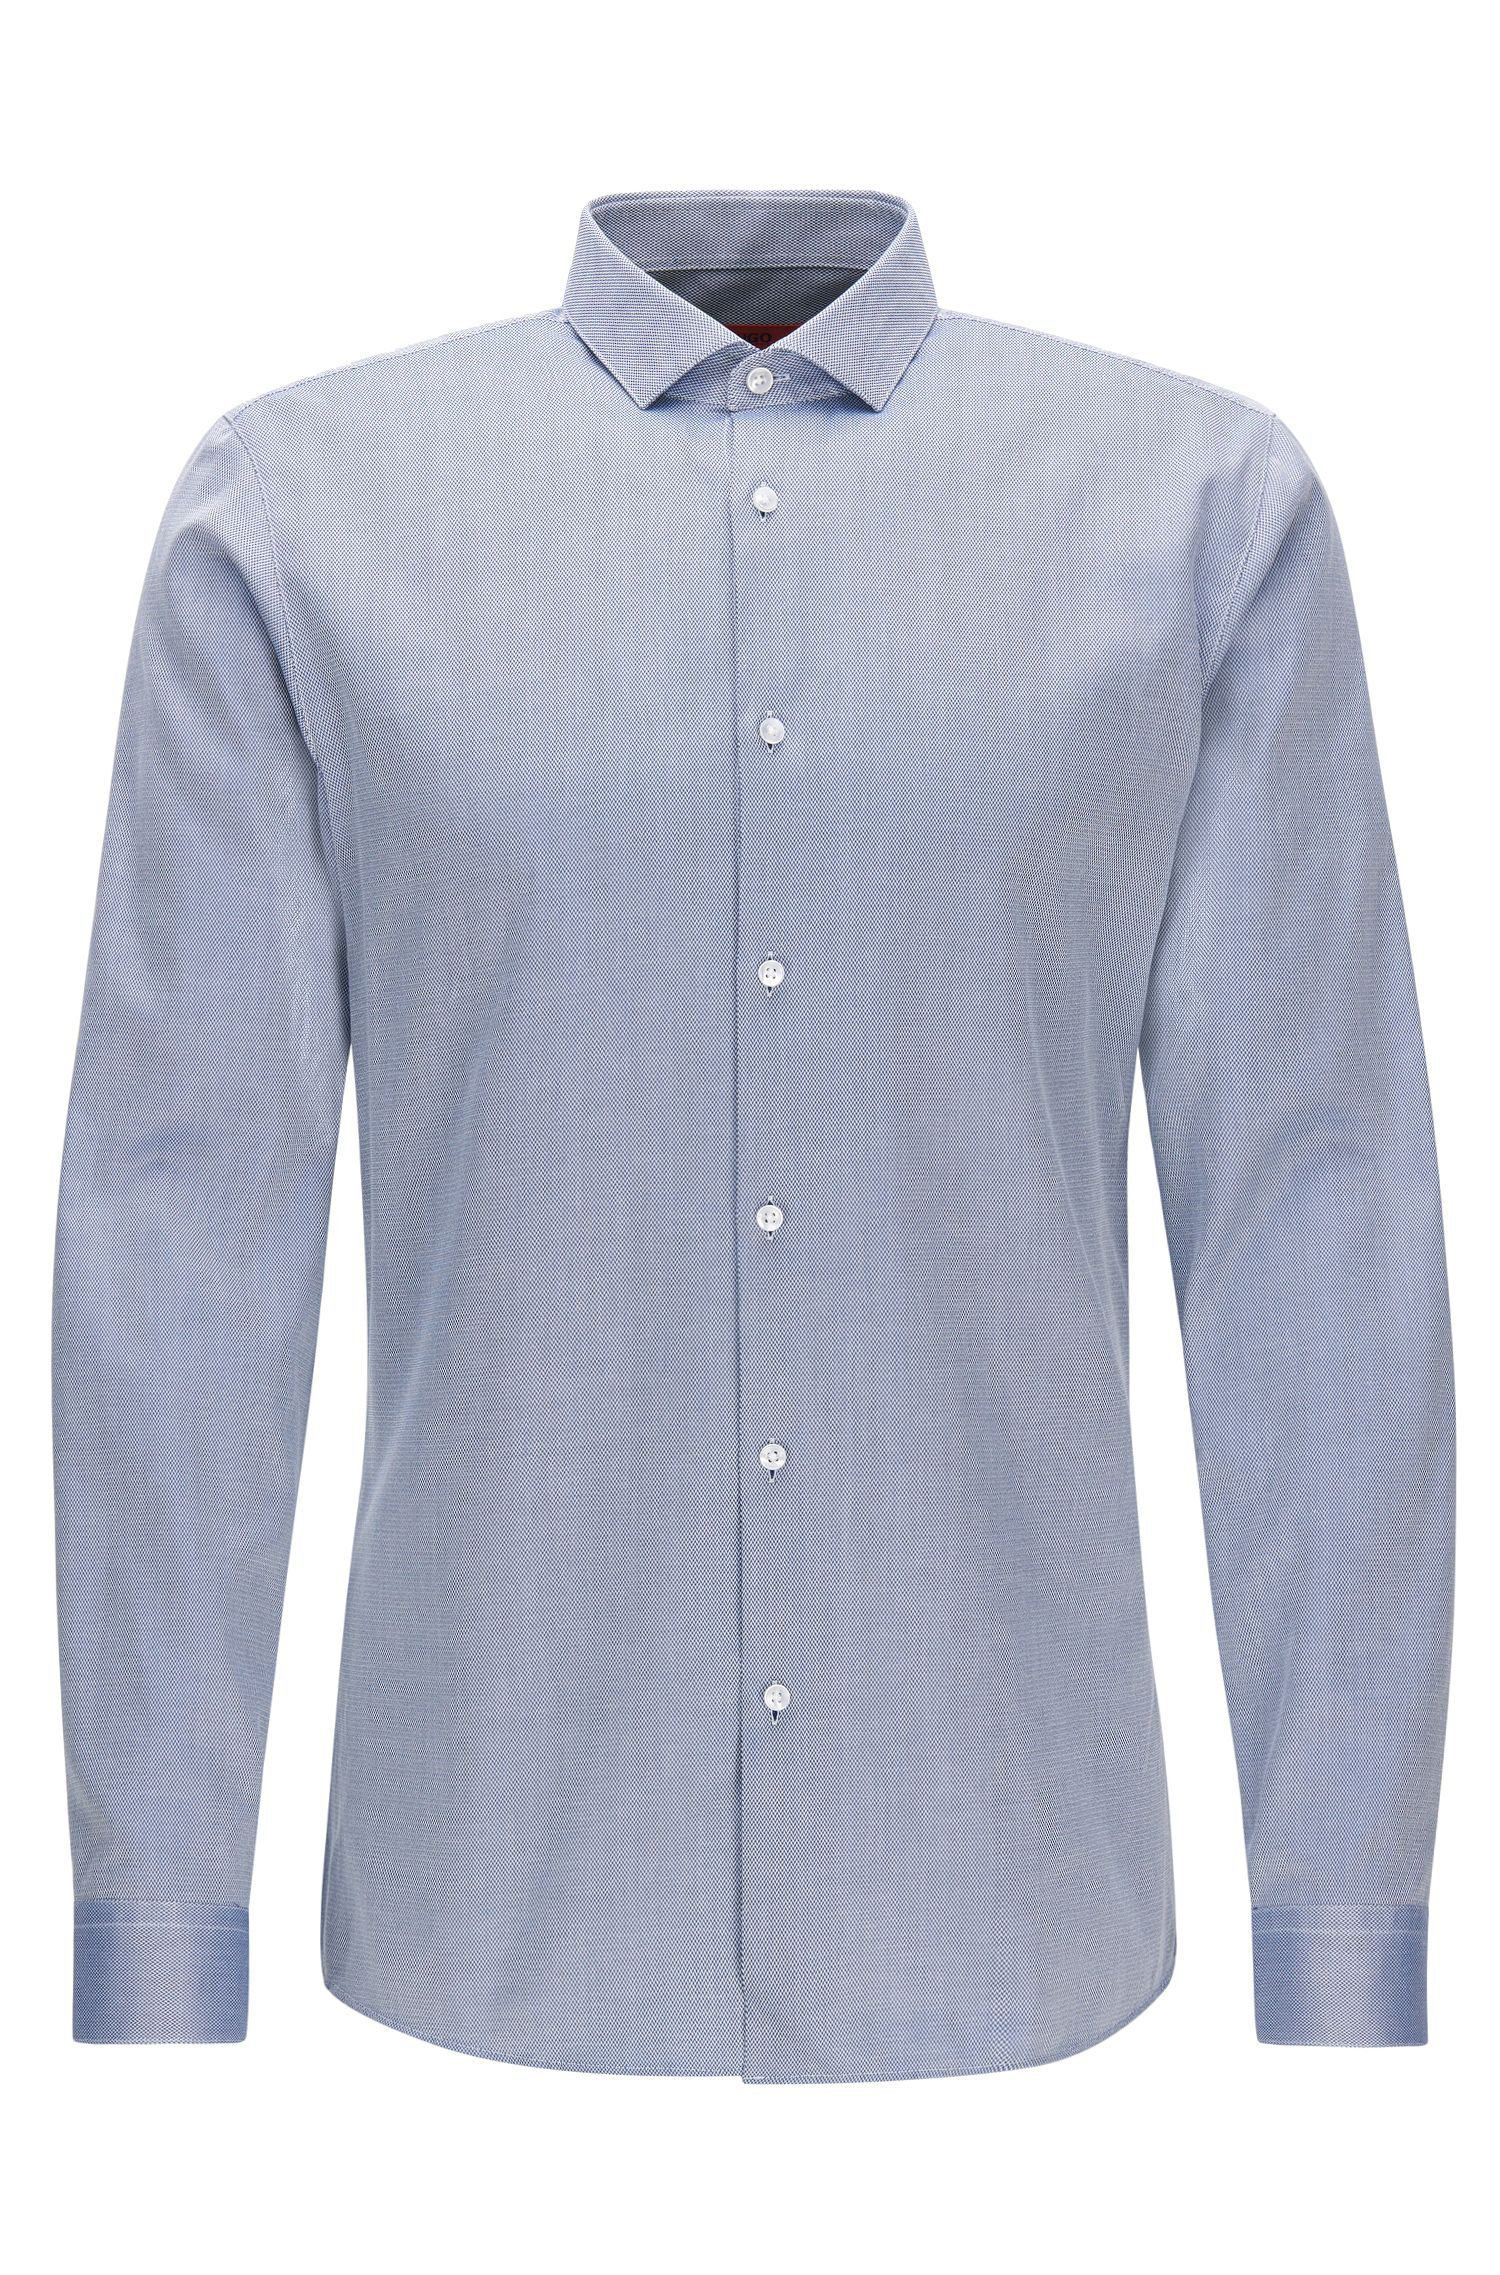 2-Ply Cotton Dress Shirt, Extra Slim Fit | Erondo, Dark Blue